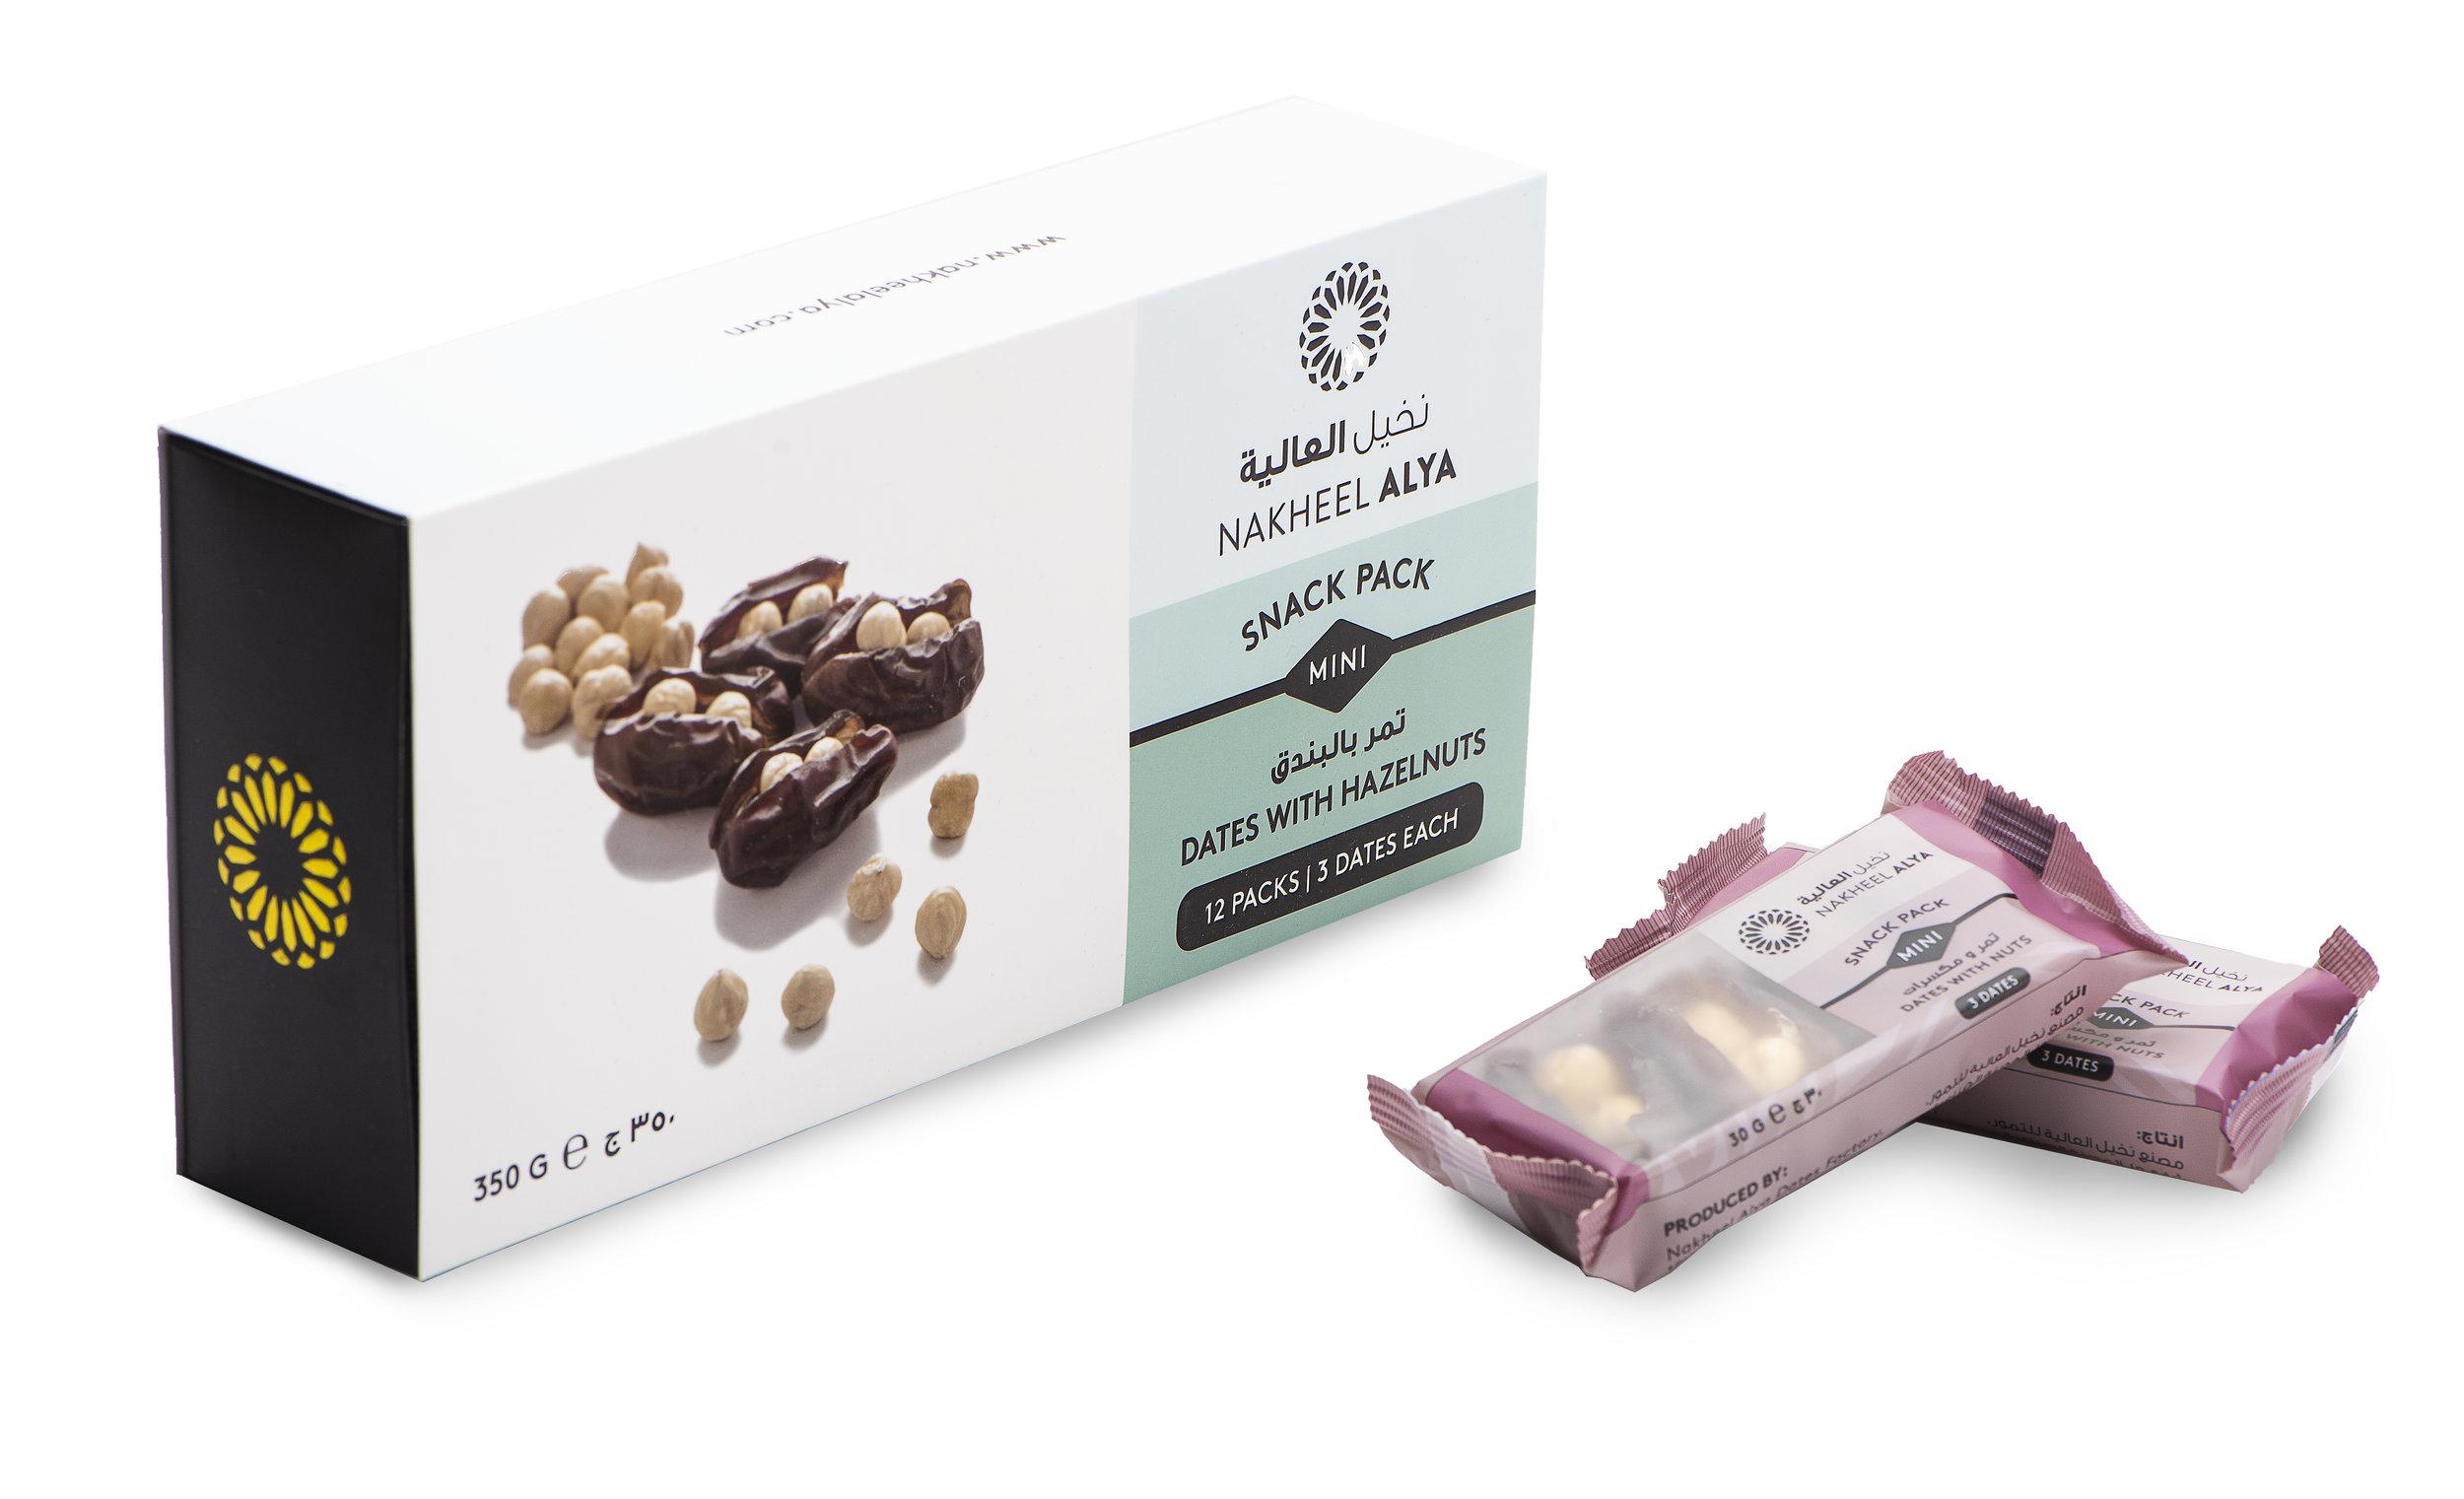 Snack Pack Mini - Dates w Hazelnuts.jpg